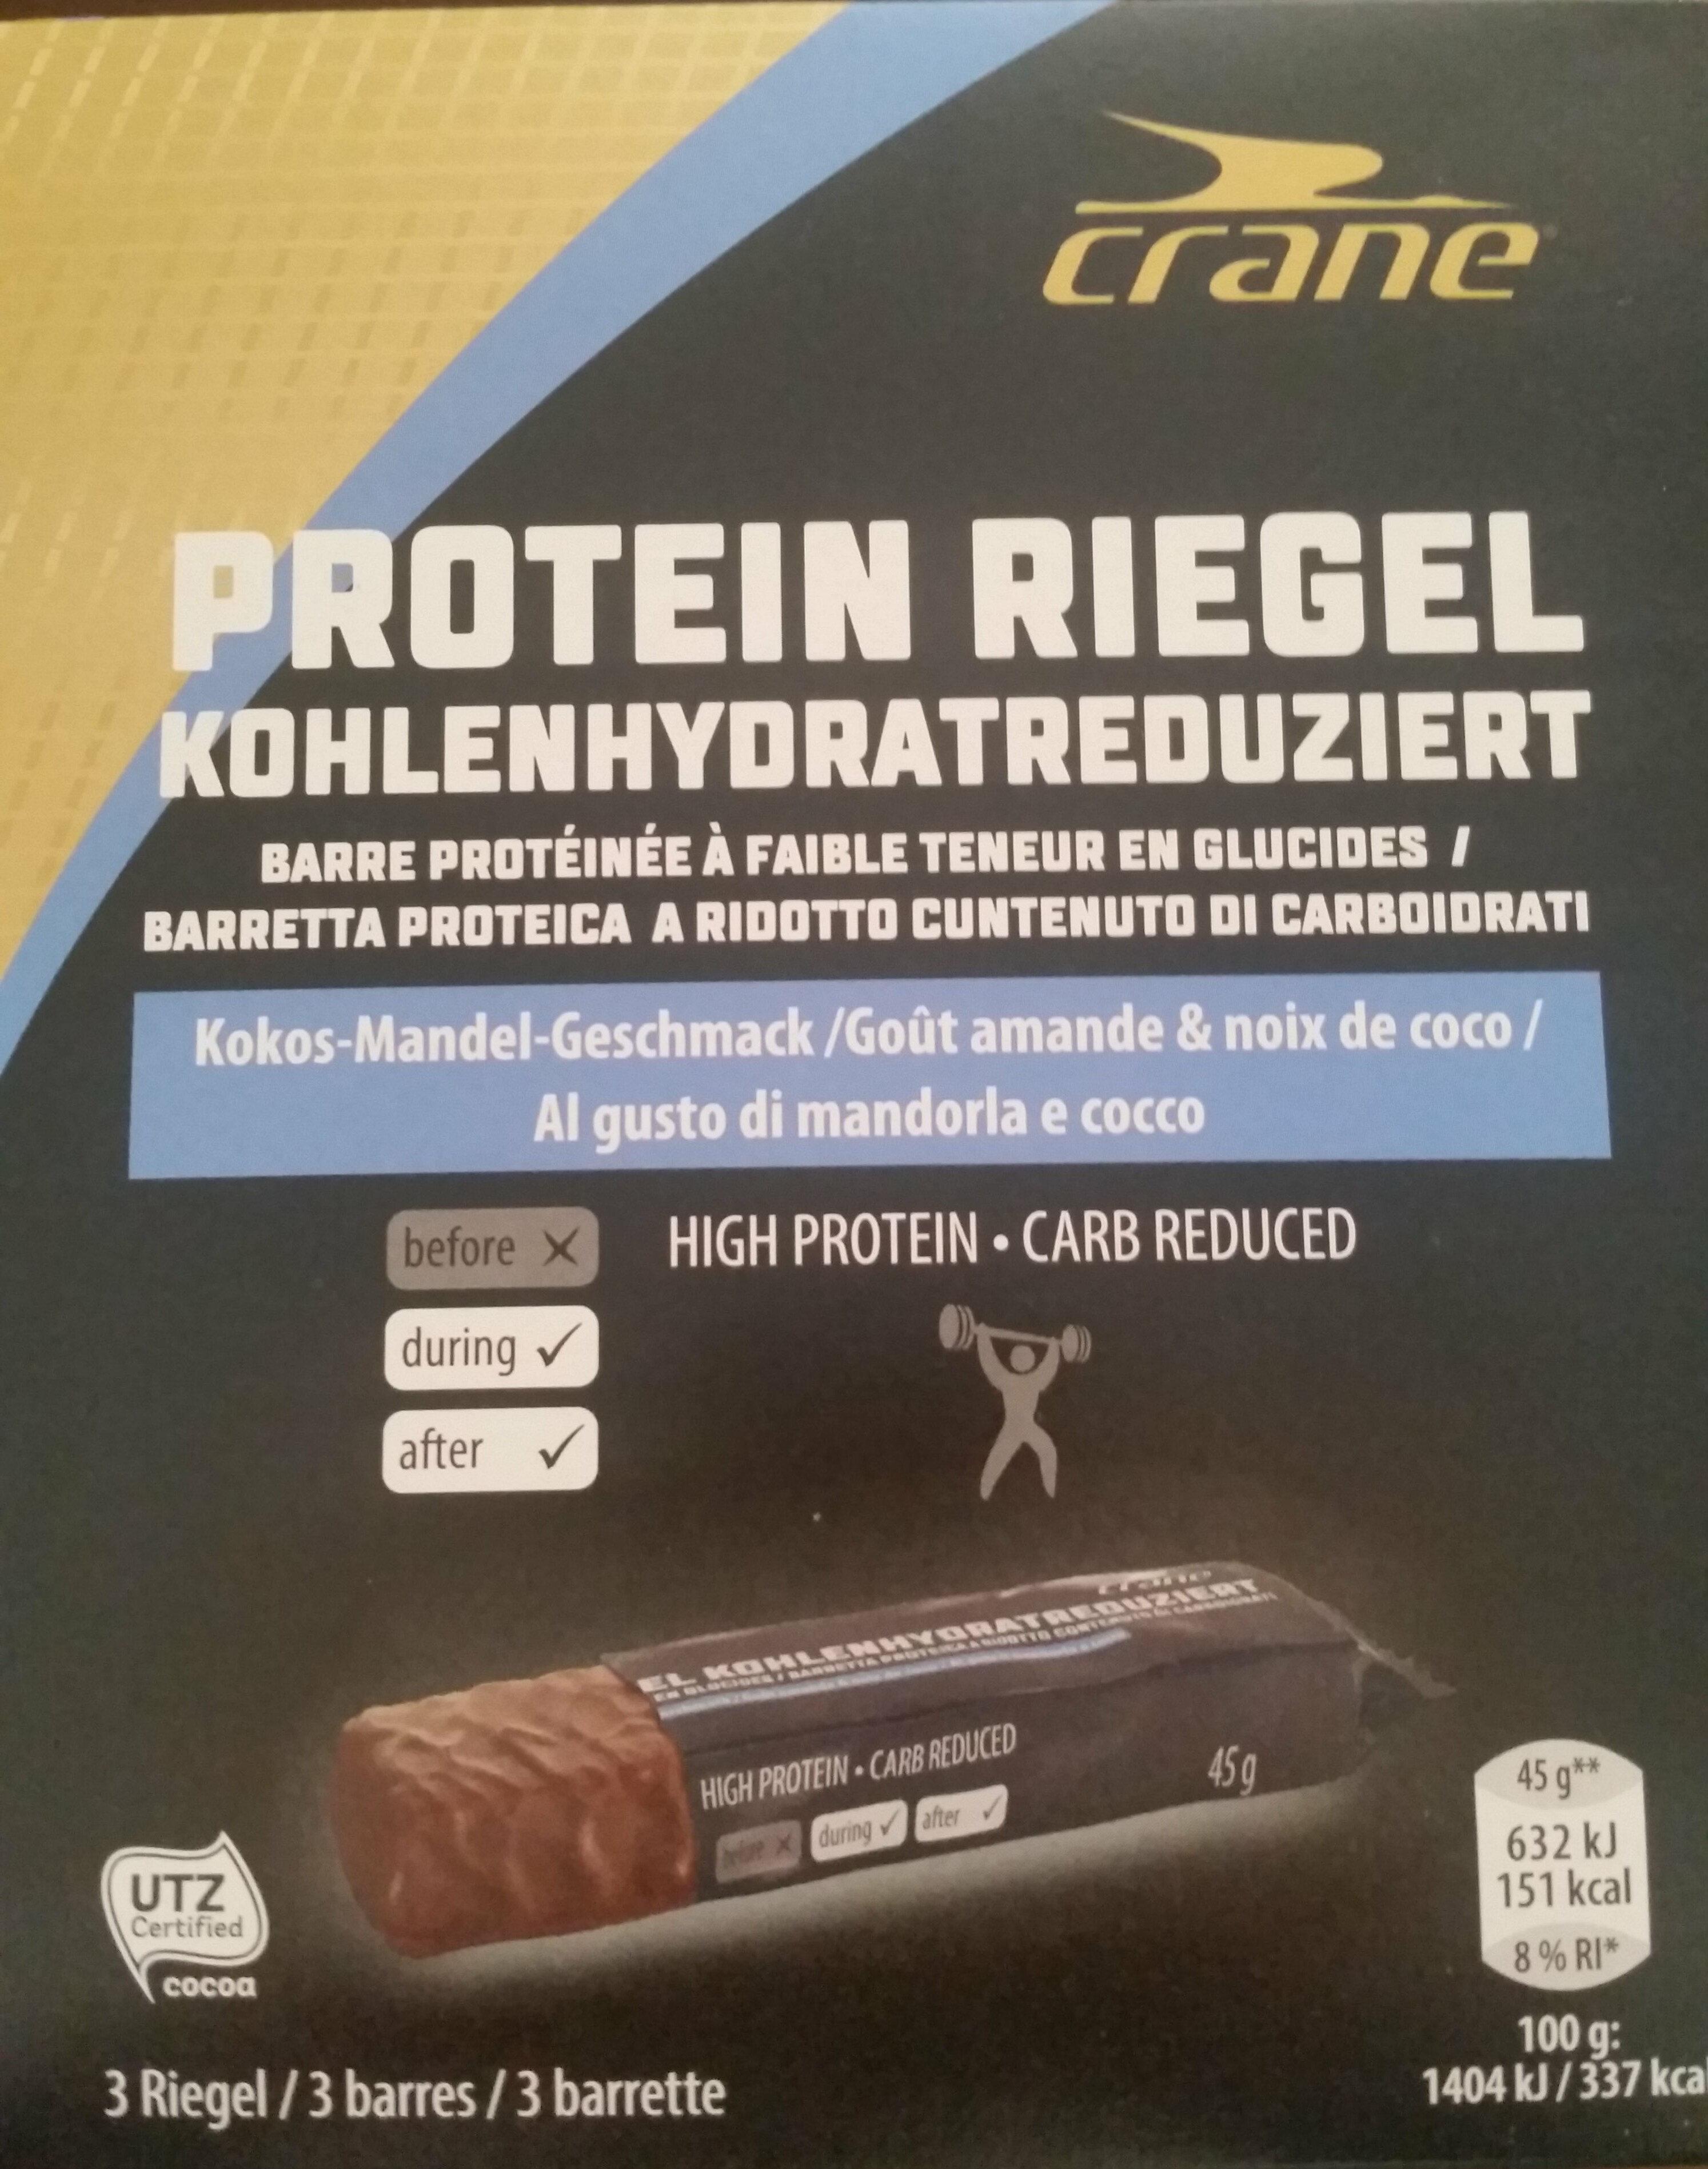 Protein riegel - Product - en